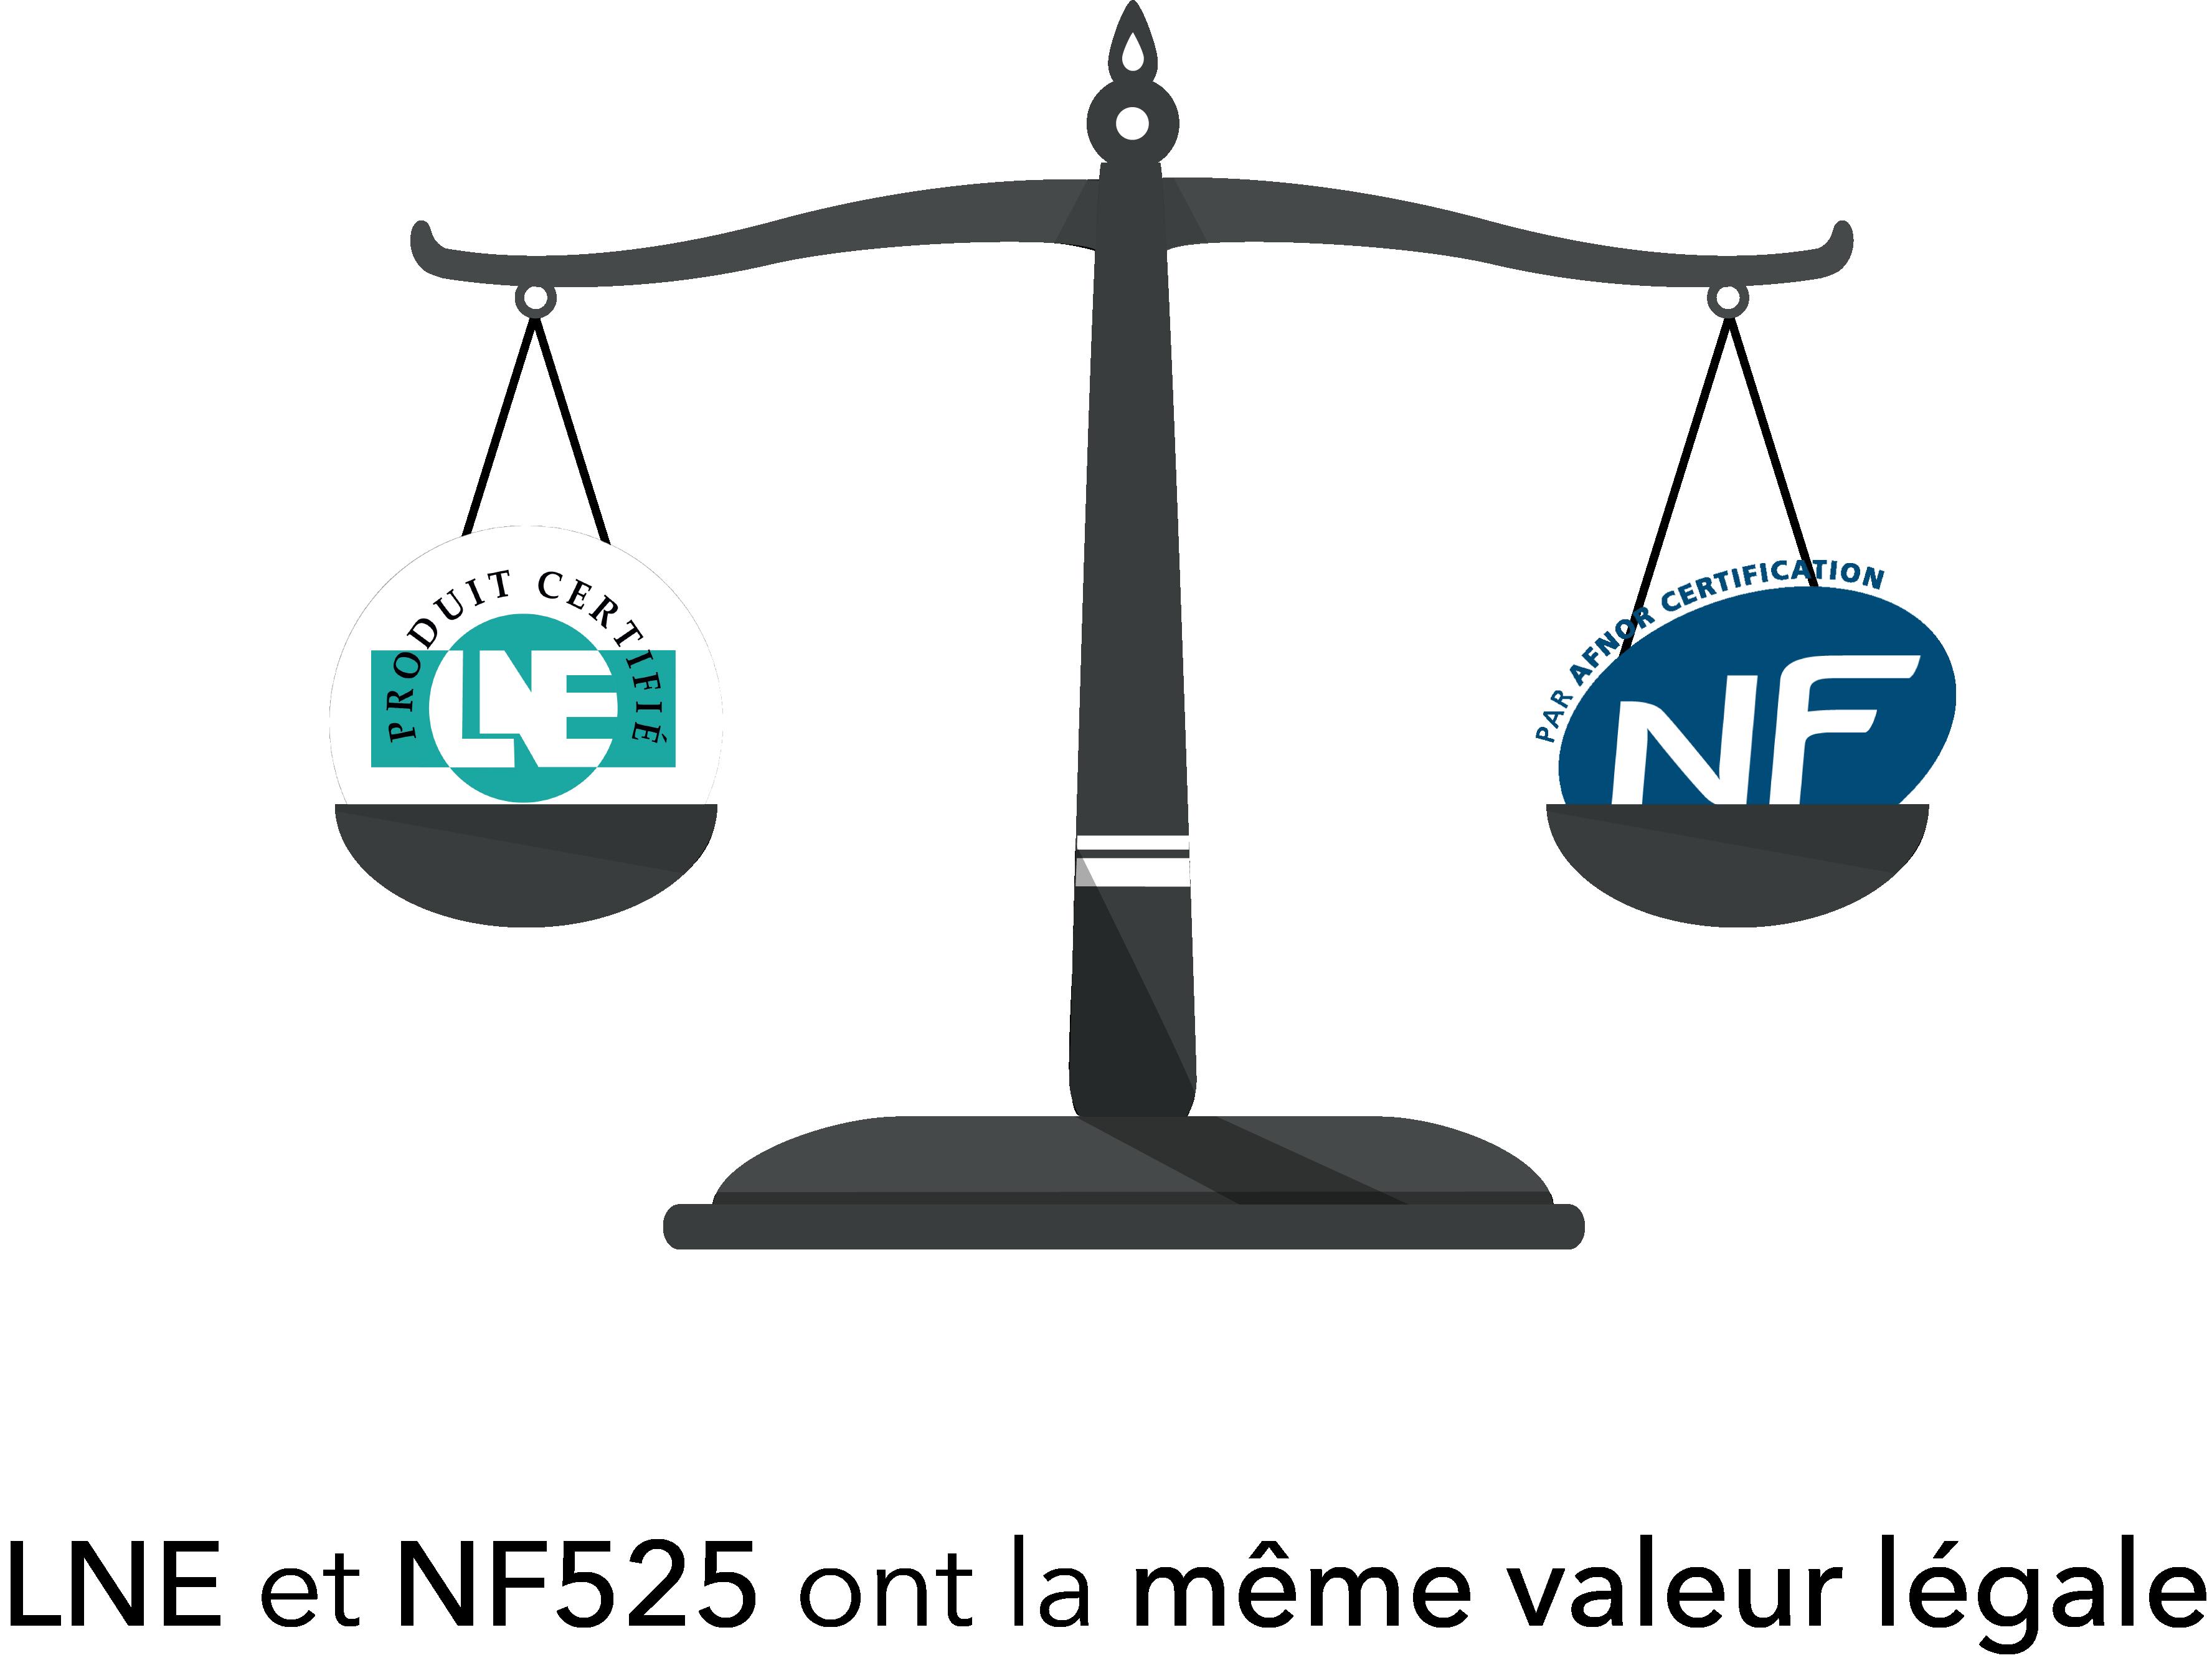 LNE NF525 MEME VALEUR